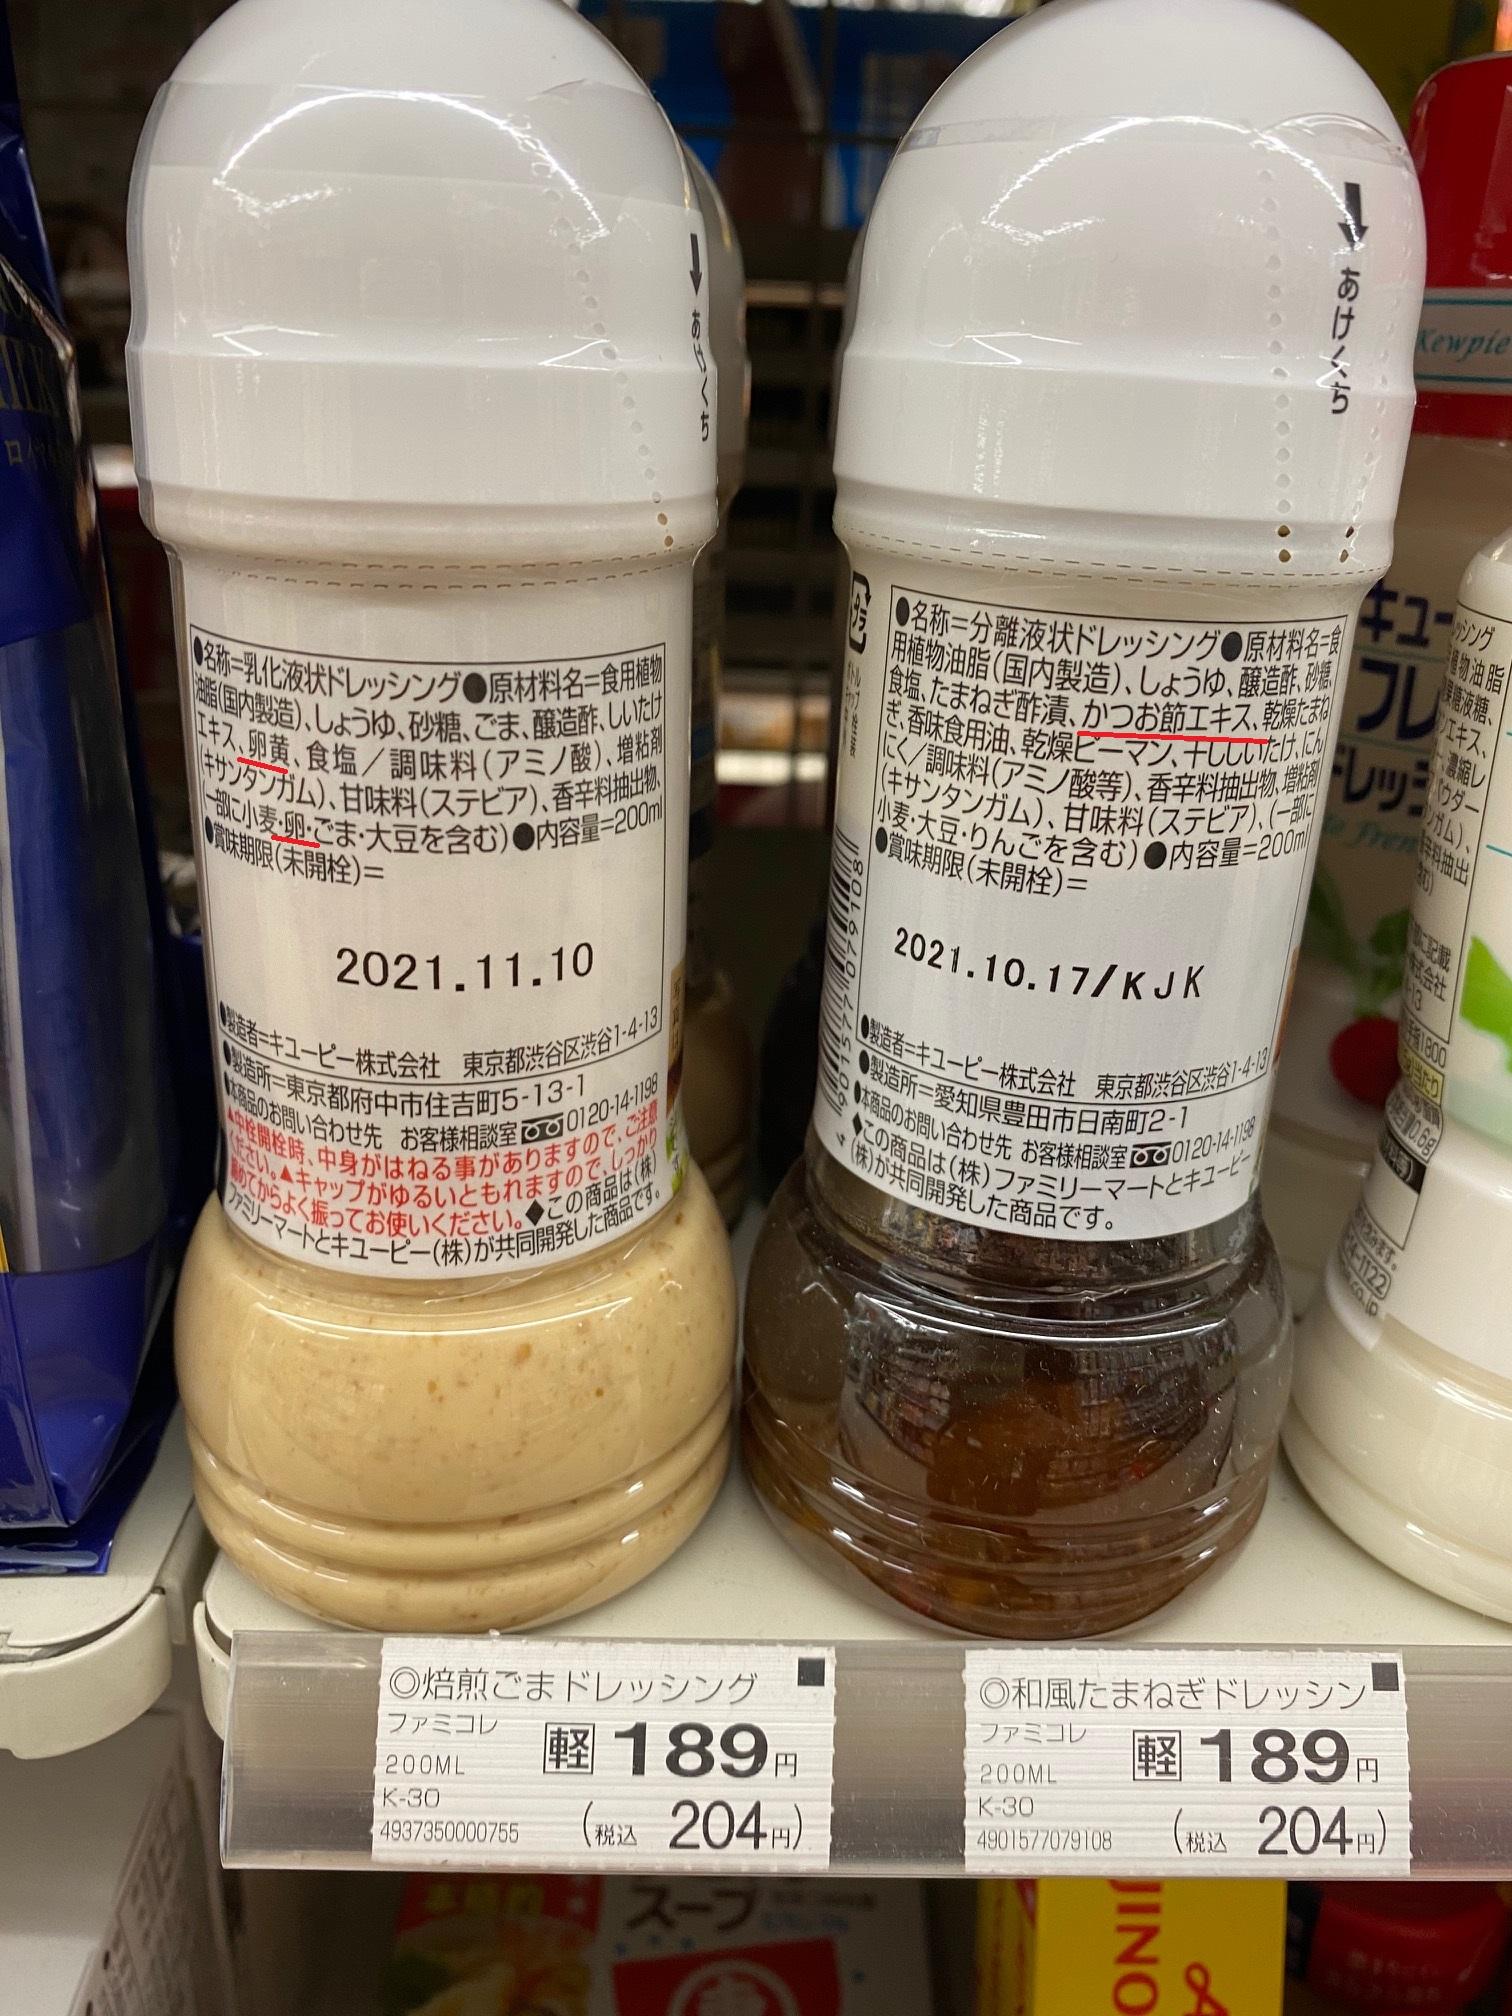 Family Mart dressing bottles ingredient lists